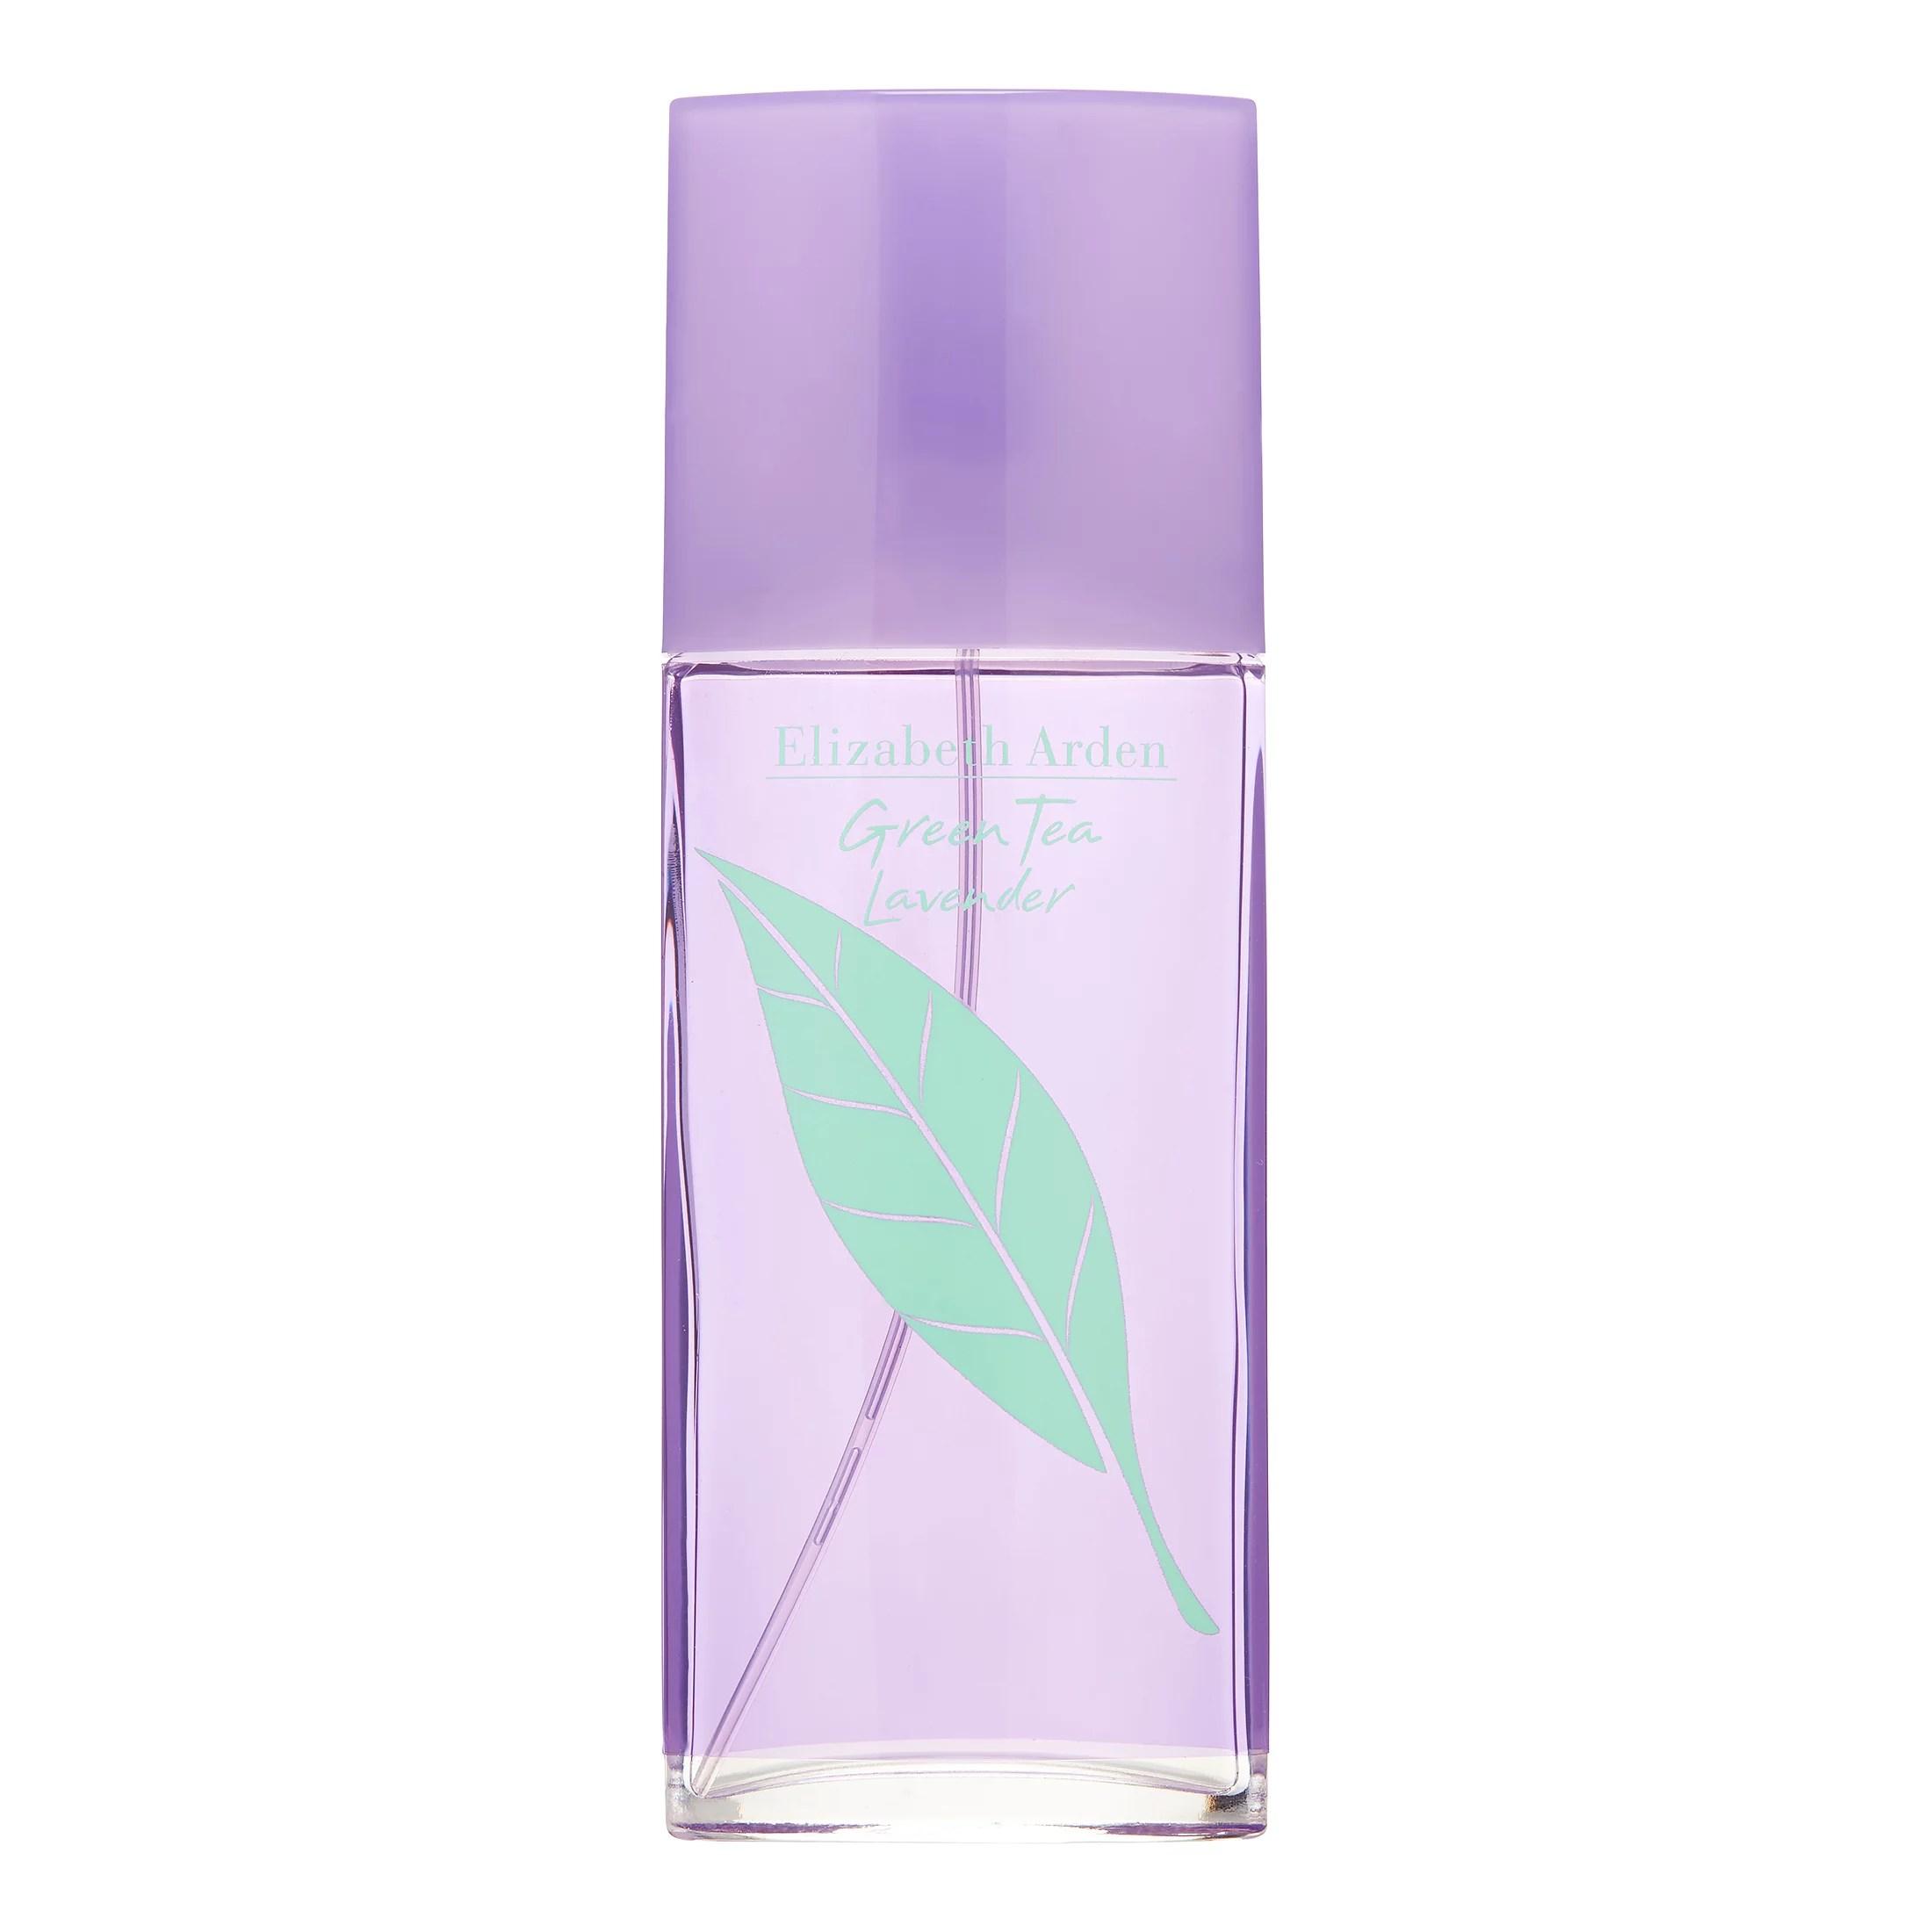 Elizabeth Arden Green Tea Lavender Eau De Toilette Spray, Perfume for Women, 3.3 Oz